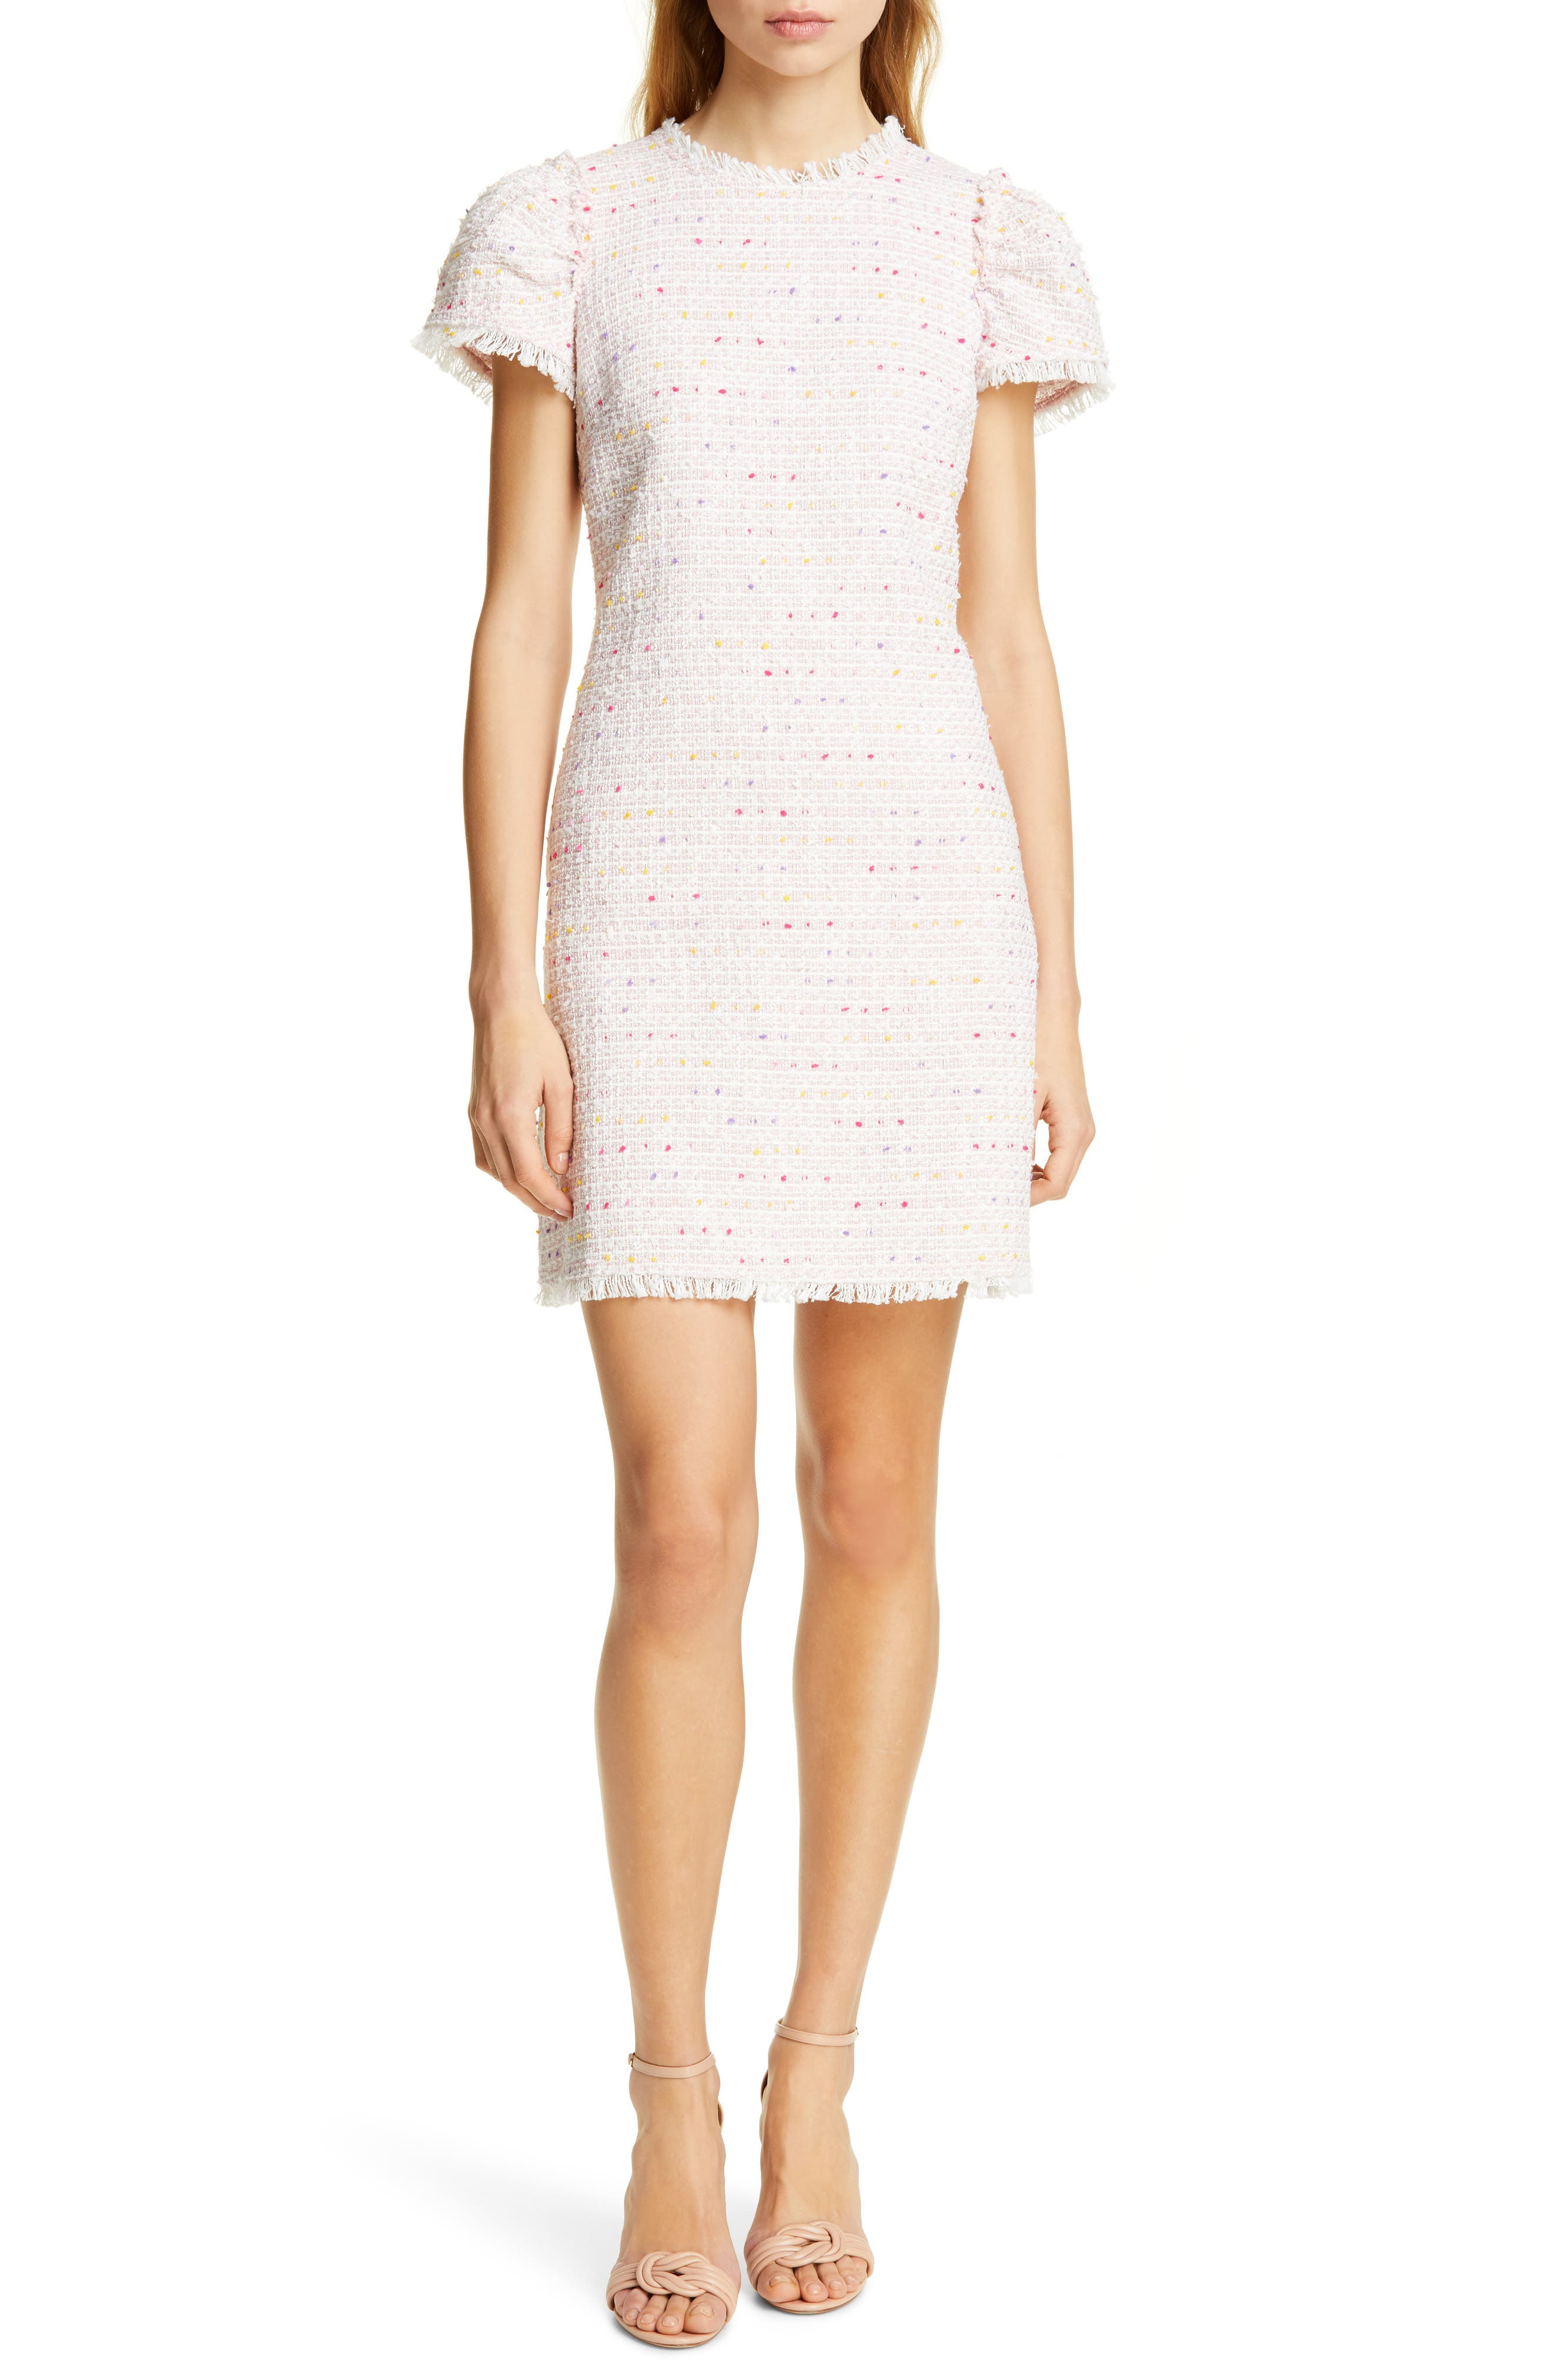 Kate Spade New York Puff Sleeve Tweed Dress, Pink